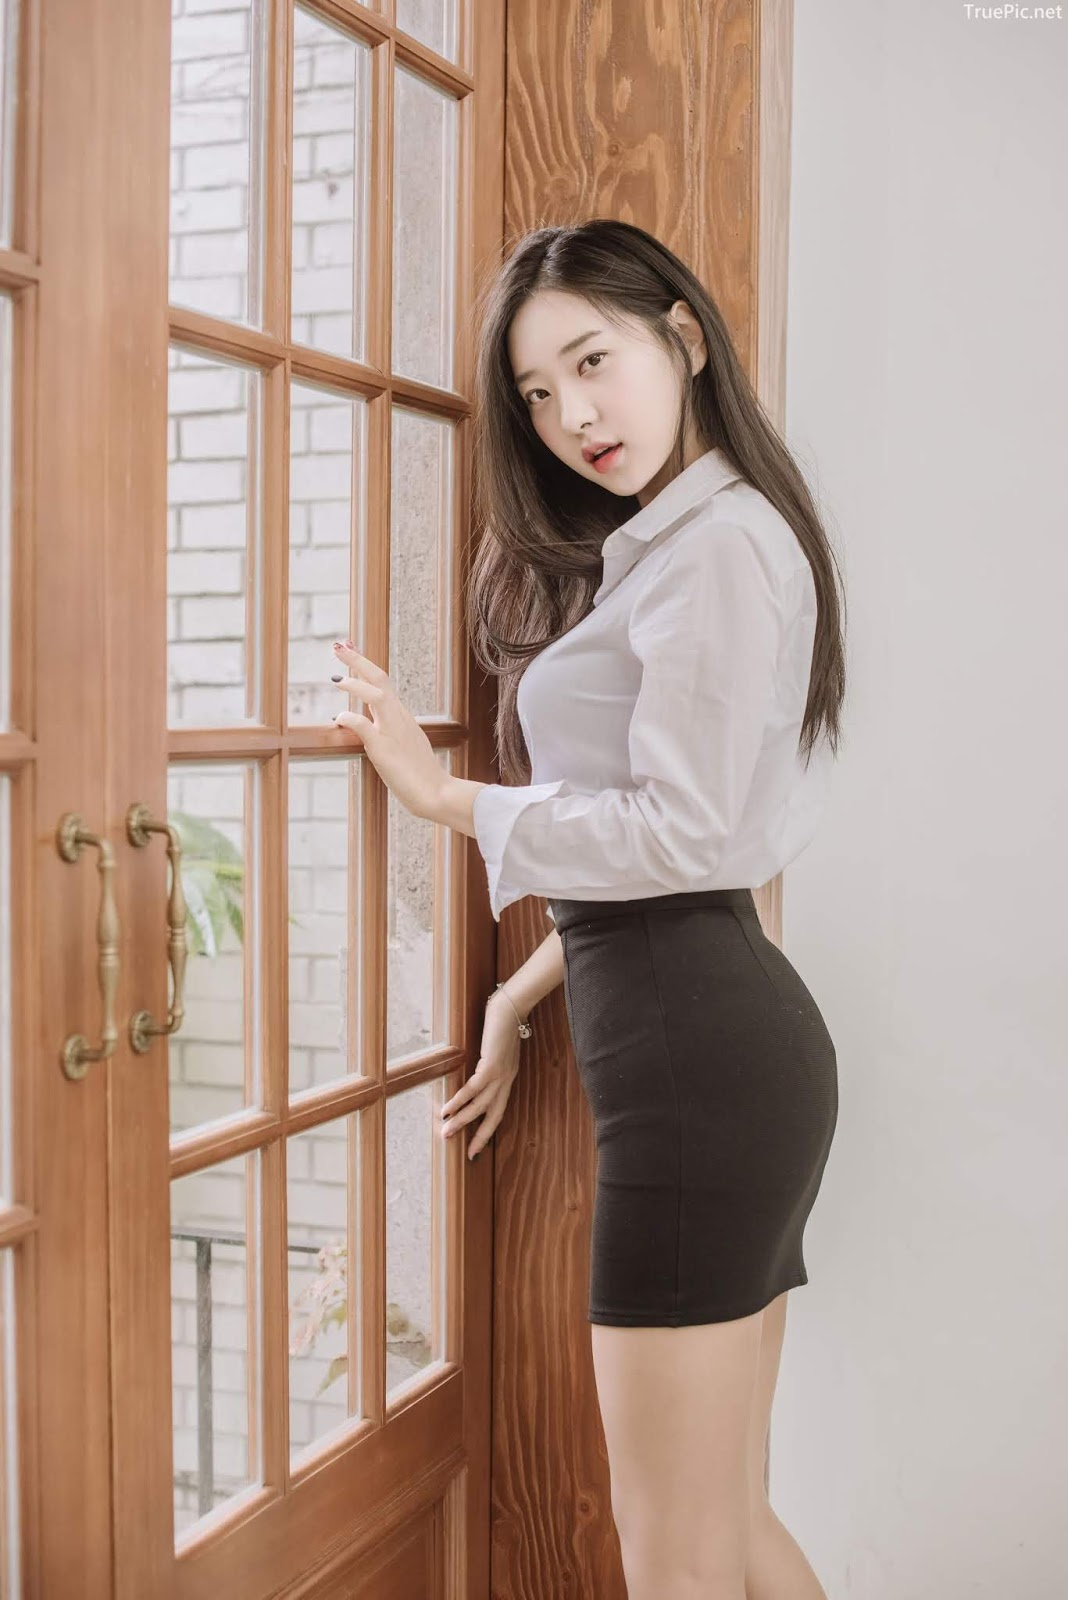 Korean hot model and fashion - Shin Jae Eun - Various Sets collection - Picture 1